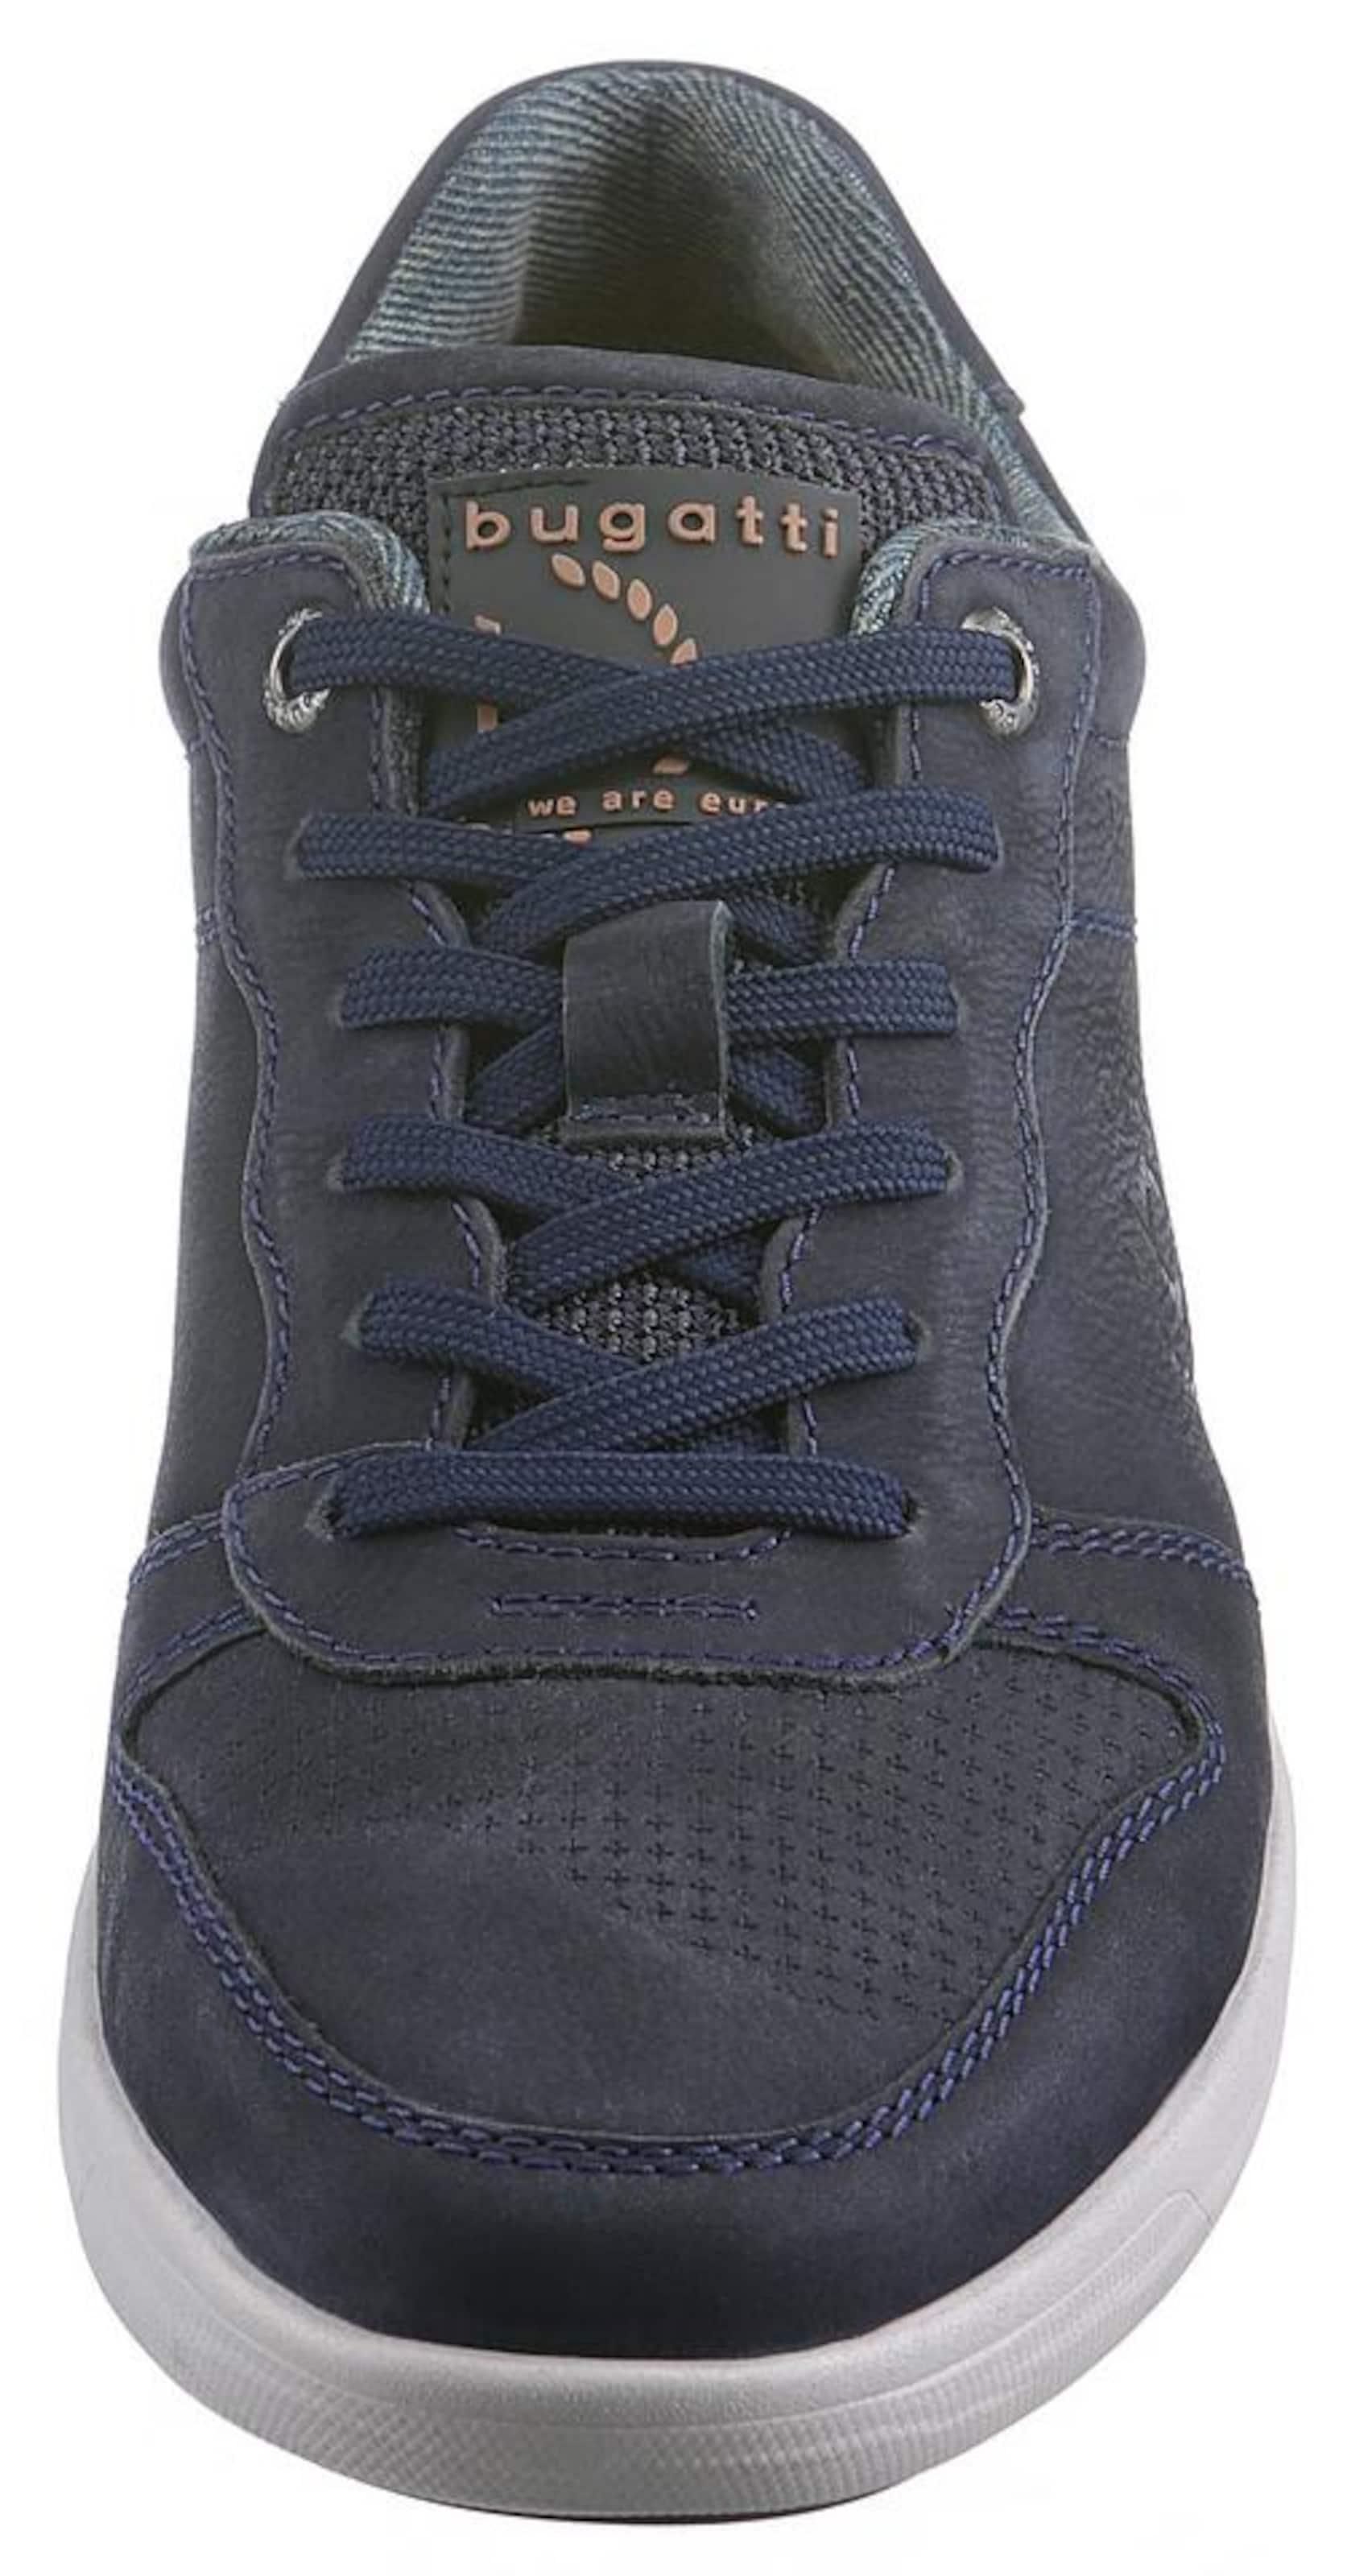 Baskets Bugatti Clair grisBronze Bleu Basses En Gris vm0nN8w